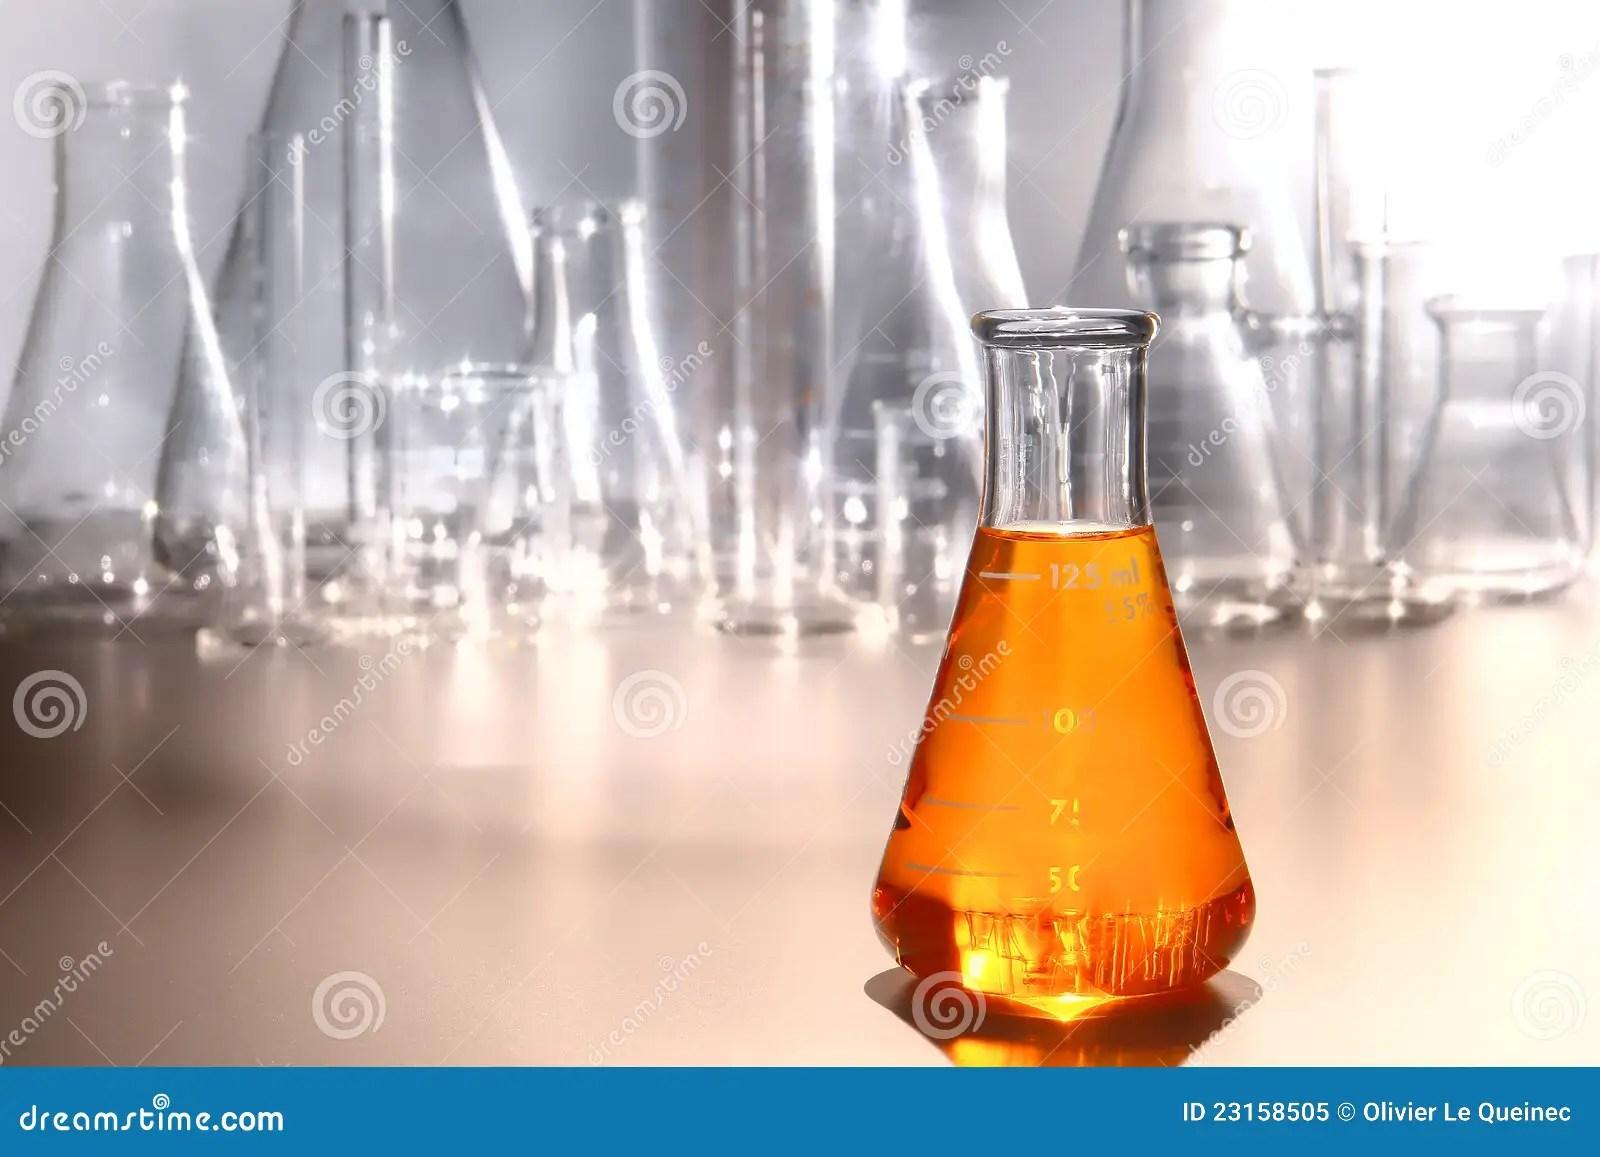 Science Laboratory Apparatus Classification Essay